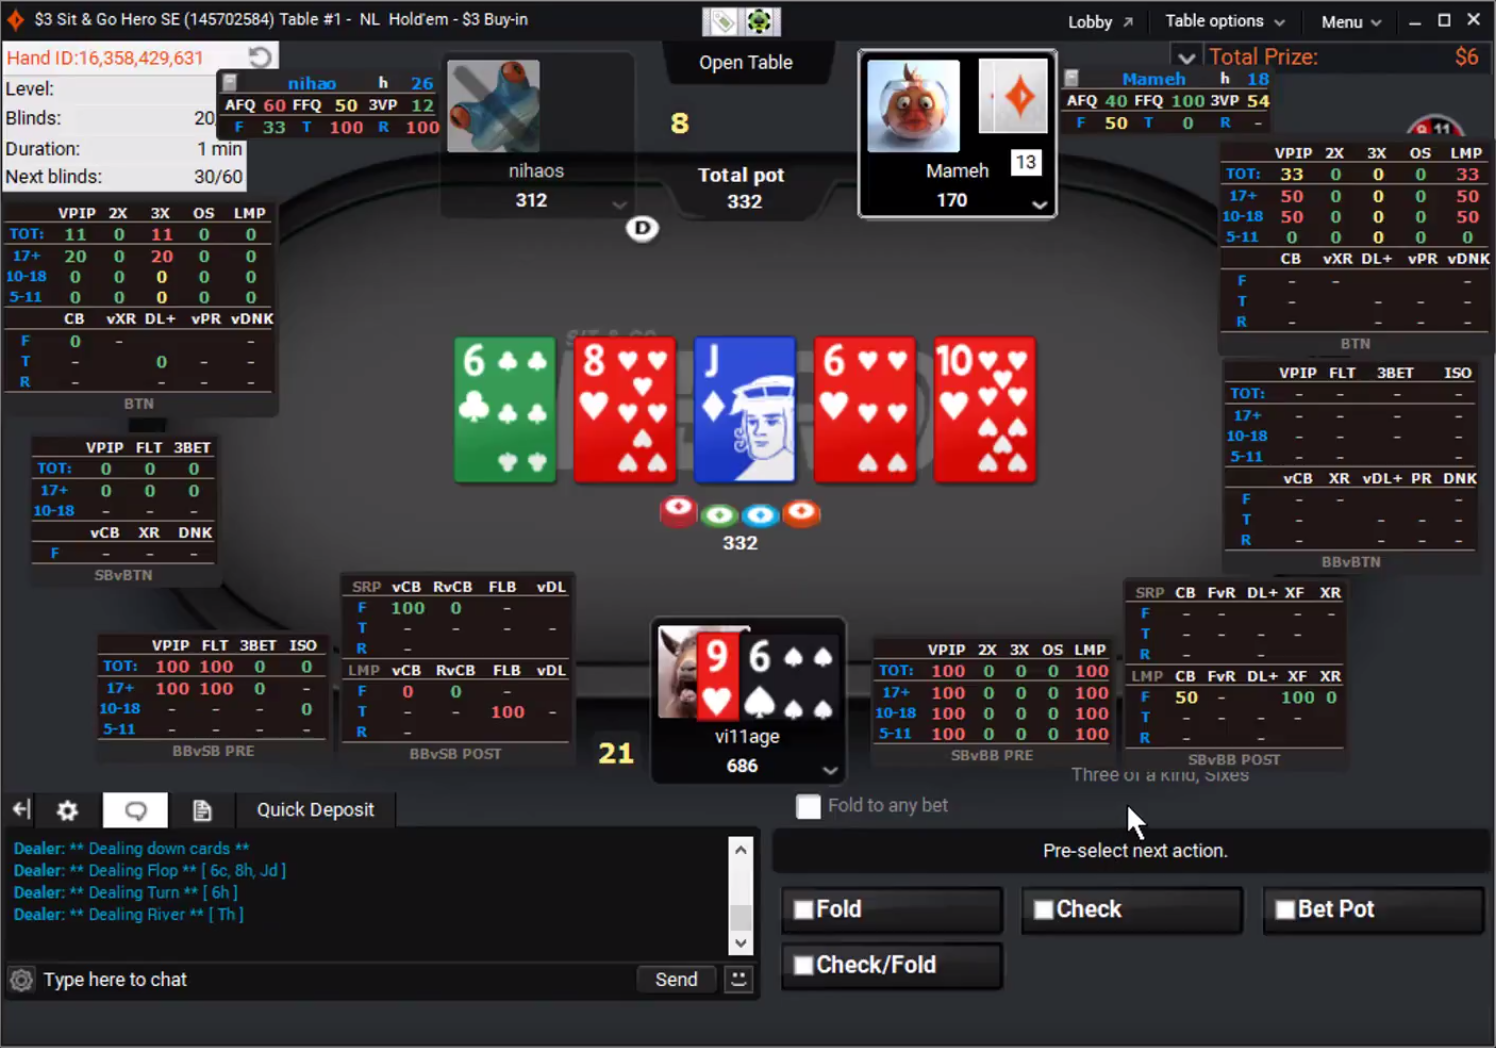 Poker Pro Hud